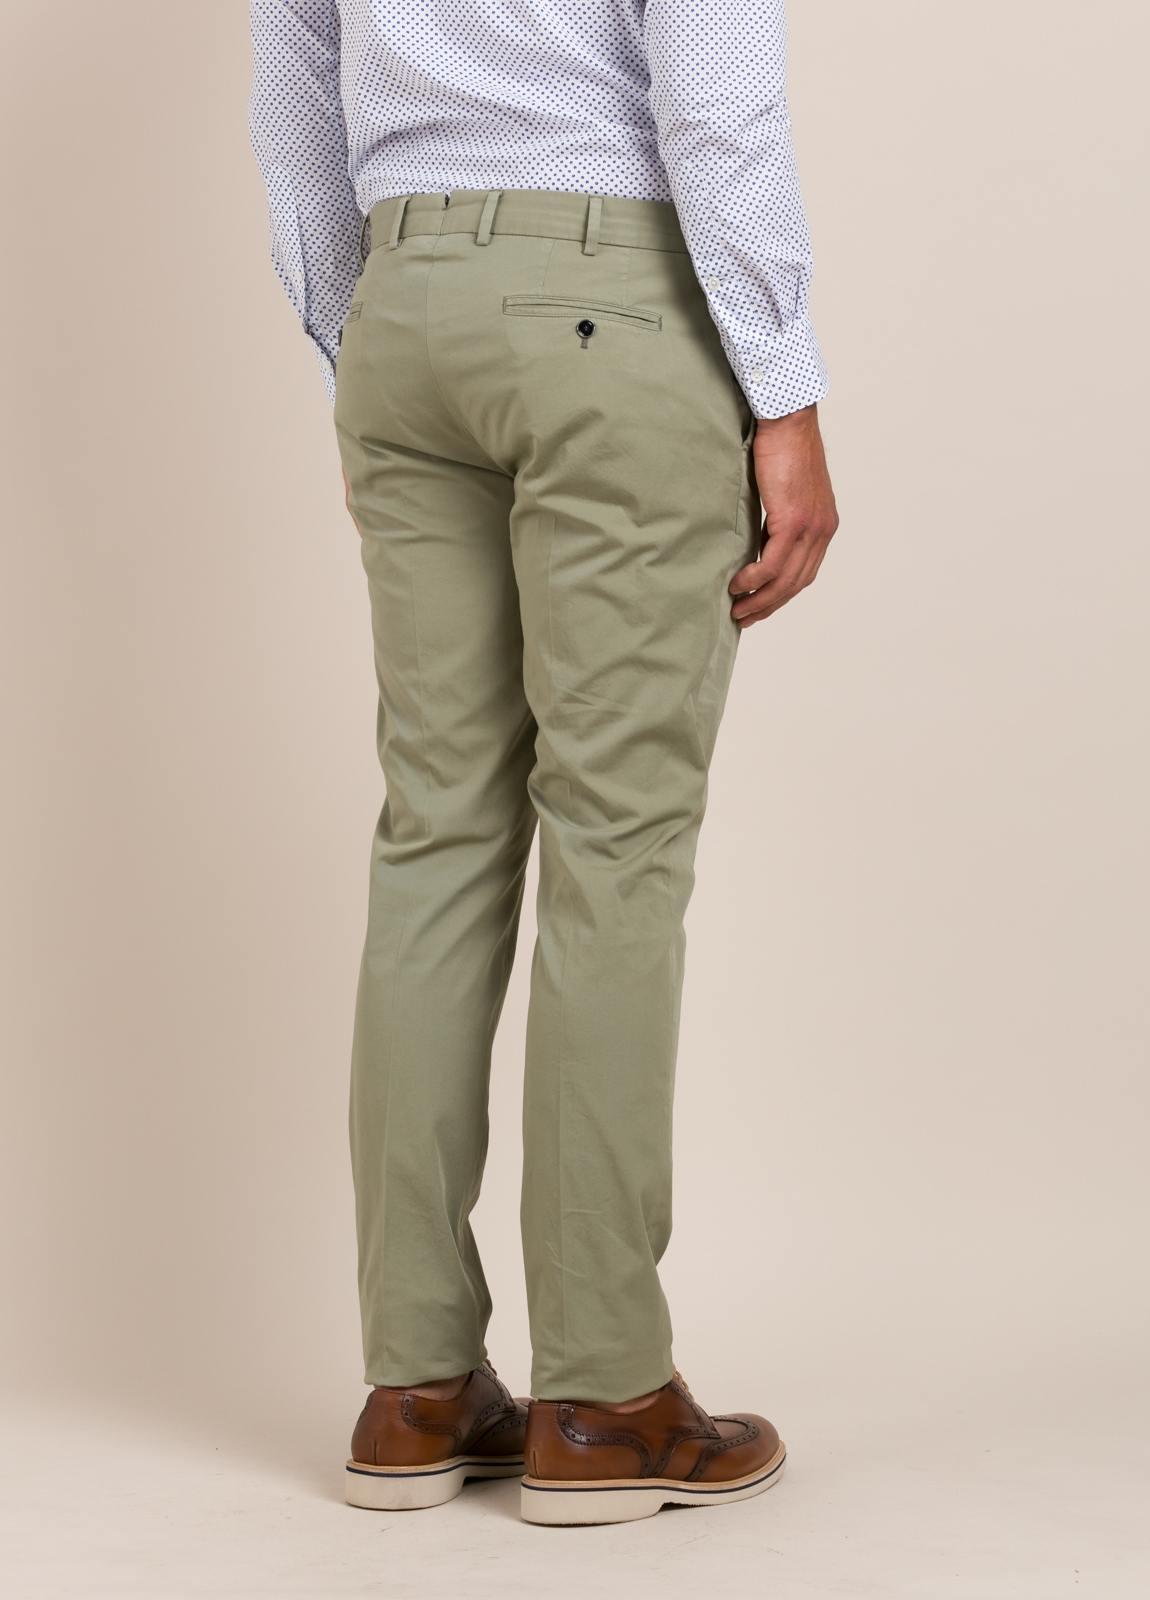 Pantalón chino FUREST COLECCIÓN Slim Fit kaki - Ítem3